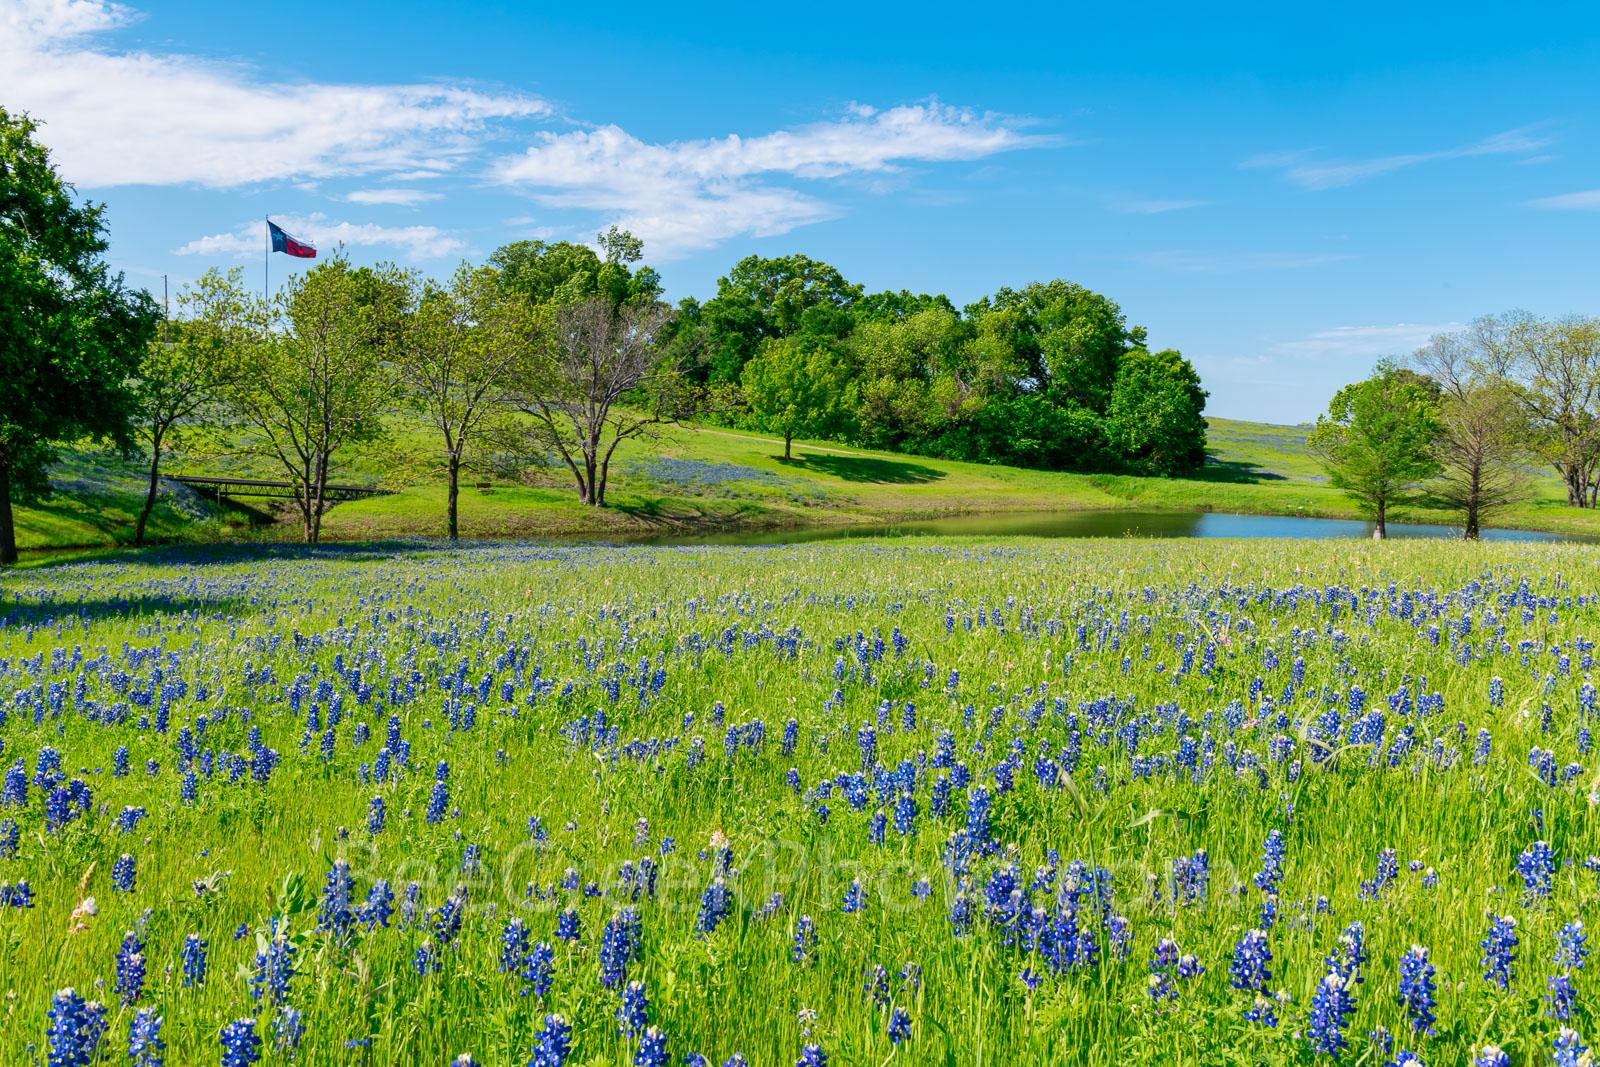 Ennis, Texas bluebonnet landscape, bluebonnets, landscape, texas, wildflowers, wildflower, blue sky, creek, Texas flag,, photo